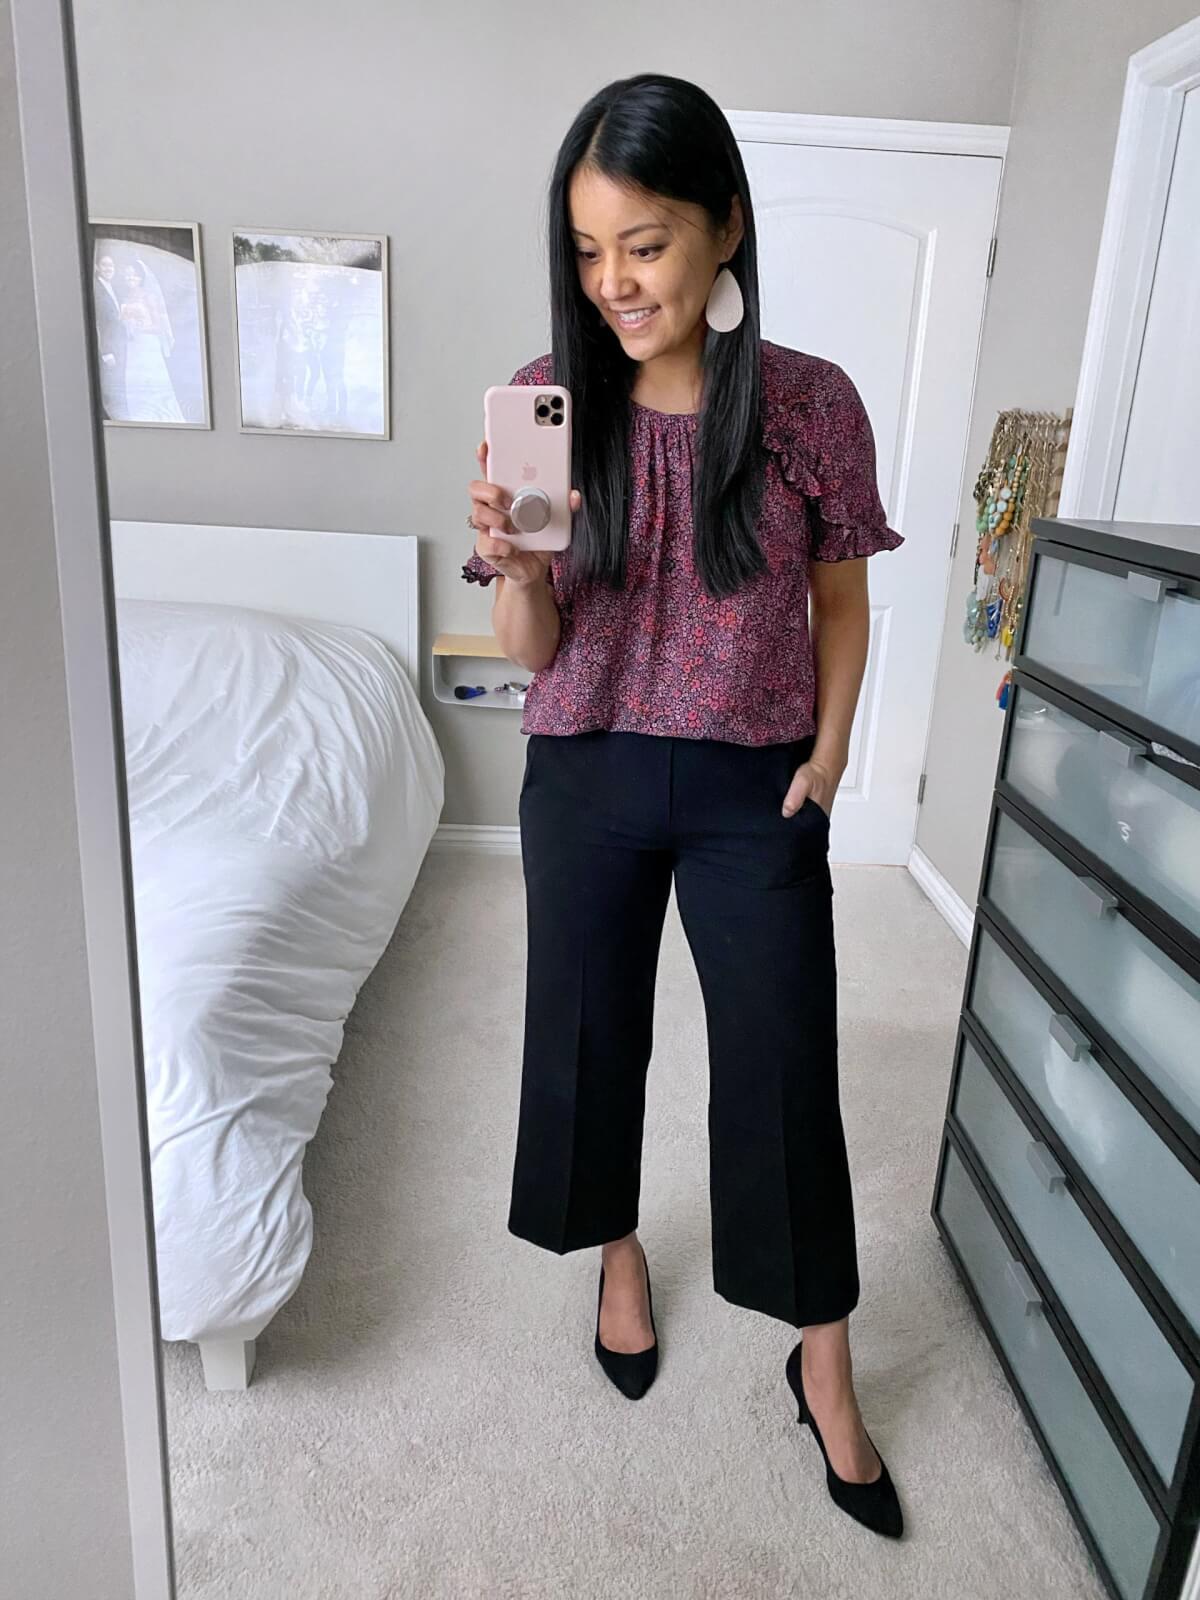 Wide Leg Pants Work Outfit: purple floral ruffle sleeve top + black wide leg pants + black pumps + white earrings